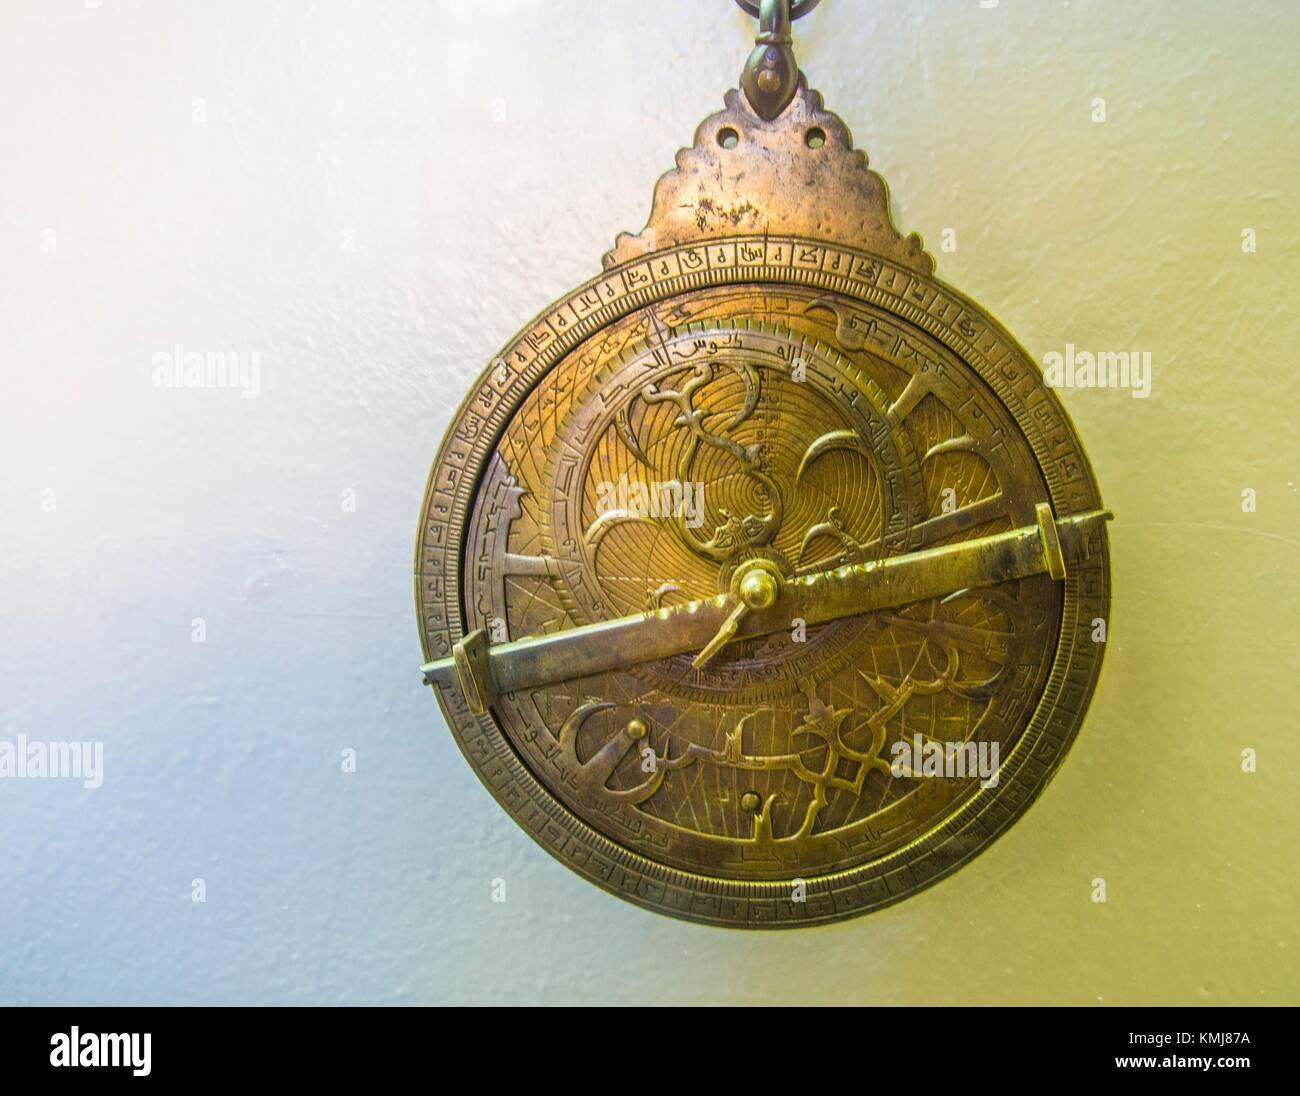 Morocco, Fes, Astrolabe,planisphérique (Laiton gravé). Med.b. Omar b. Jaafar al Karmani (1362- Hegir.714) - Stock Image